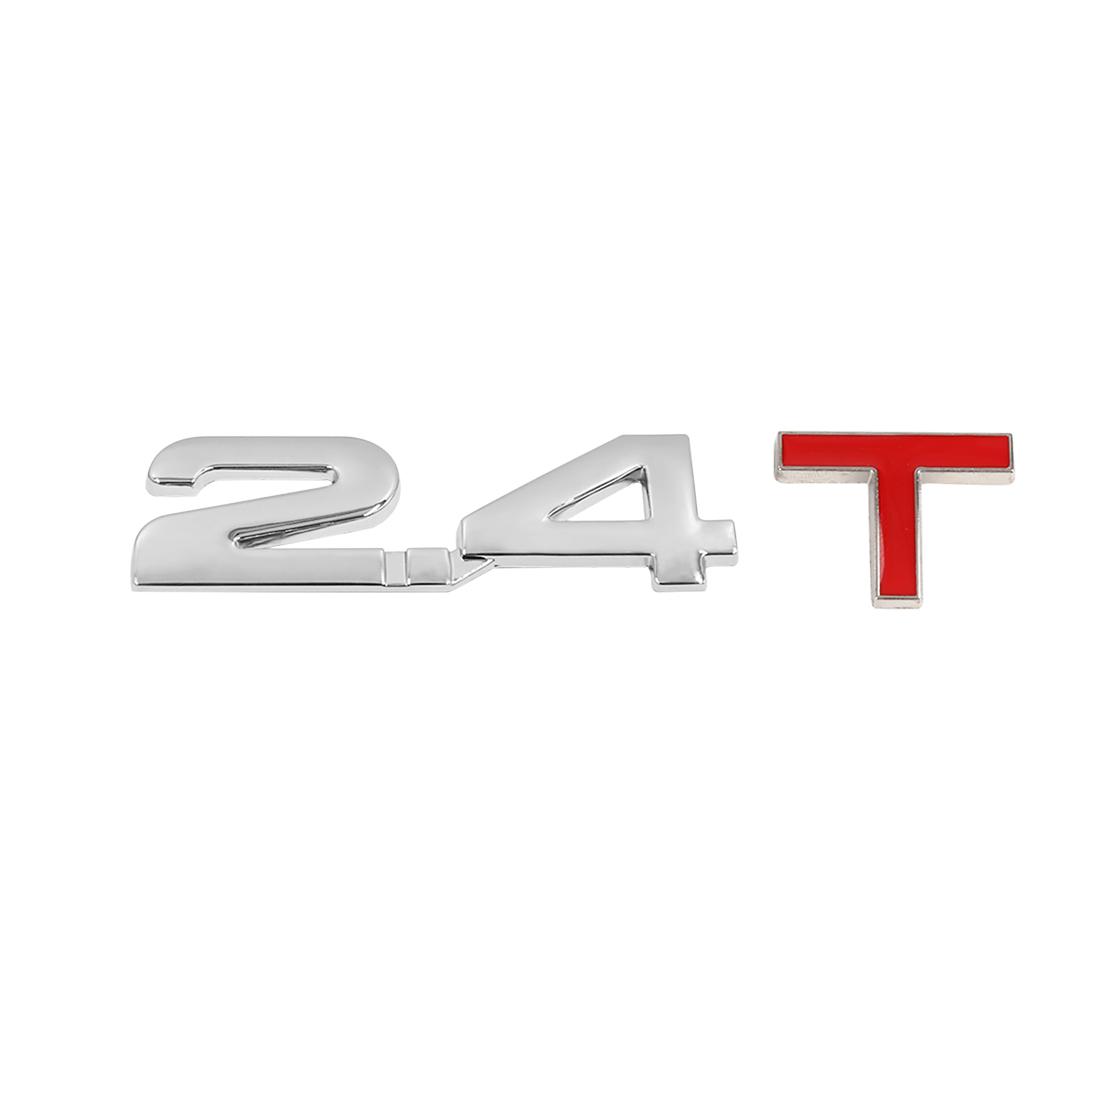 Universal 3D Metal 2.4T Shaped Car Decorative Emblem Badge Decal Sticker